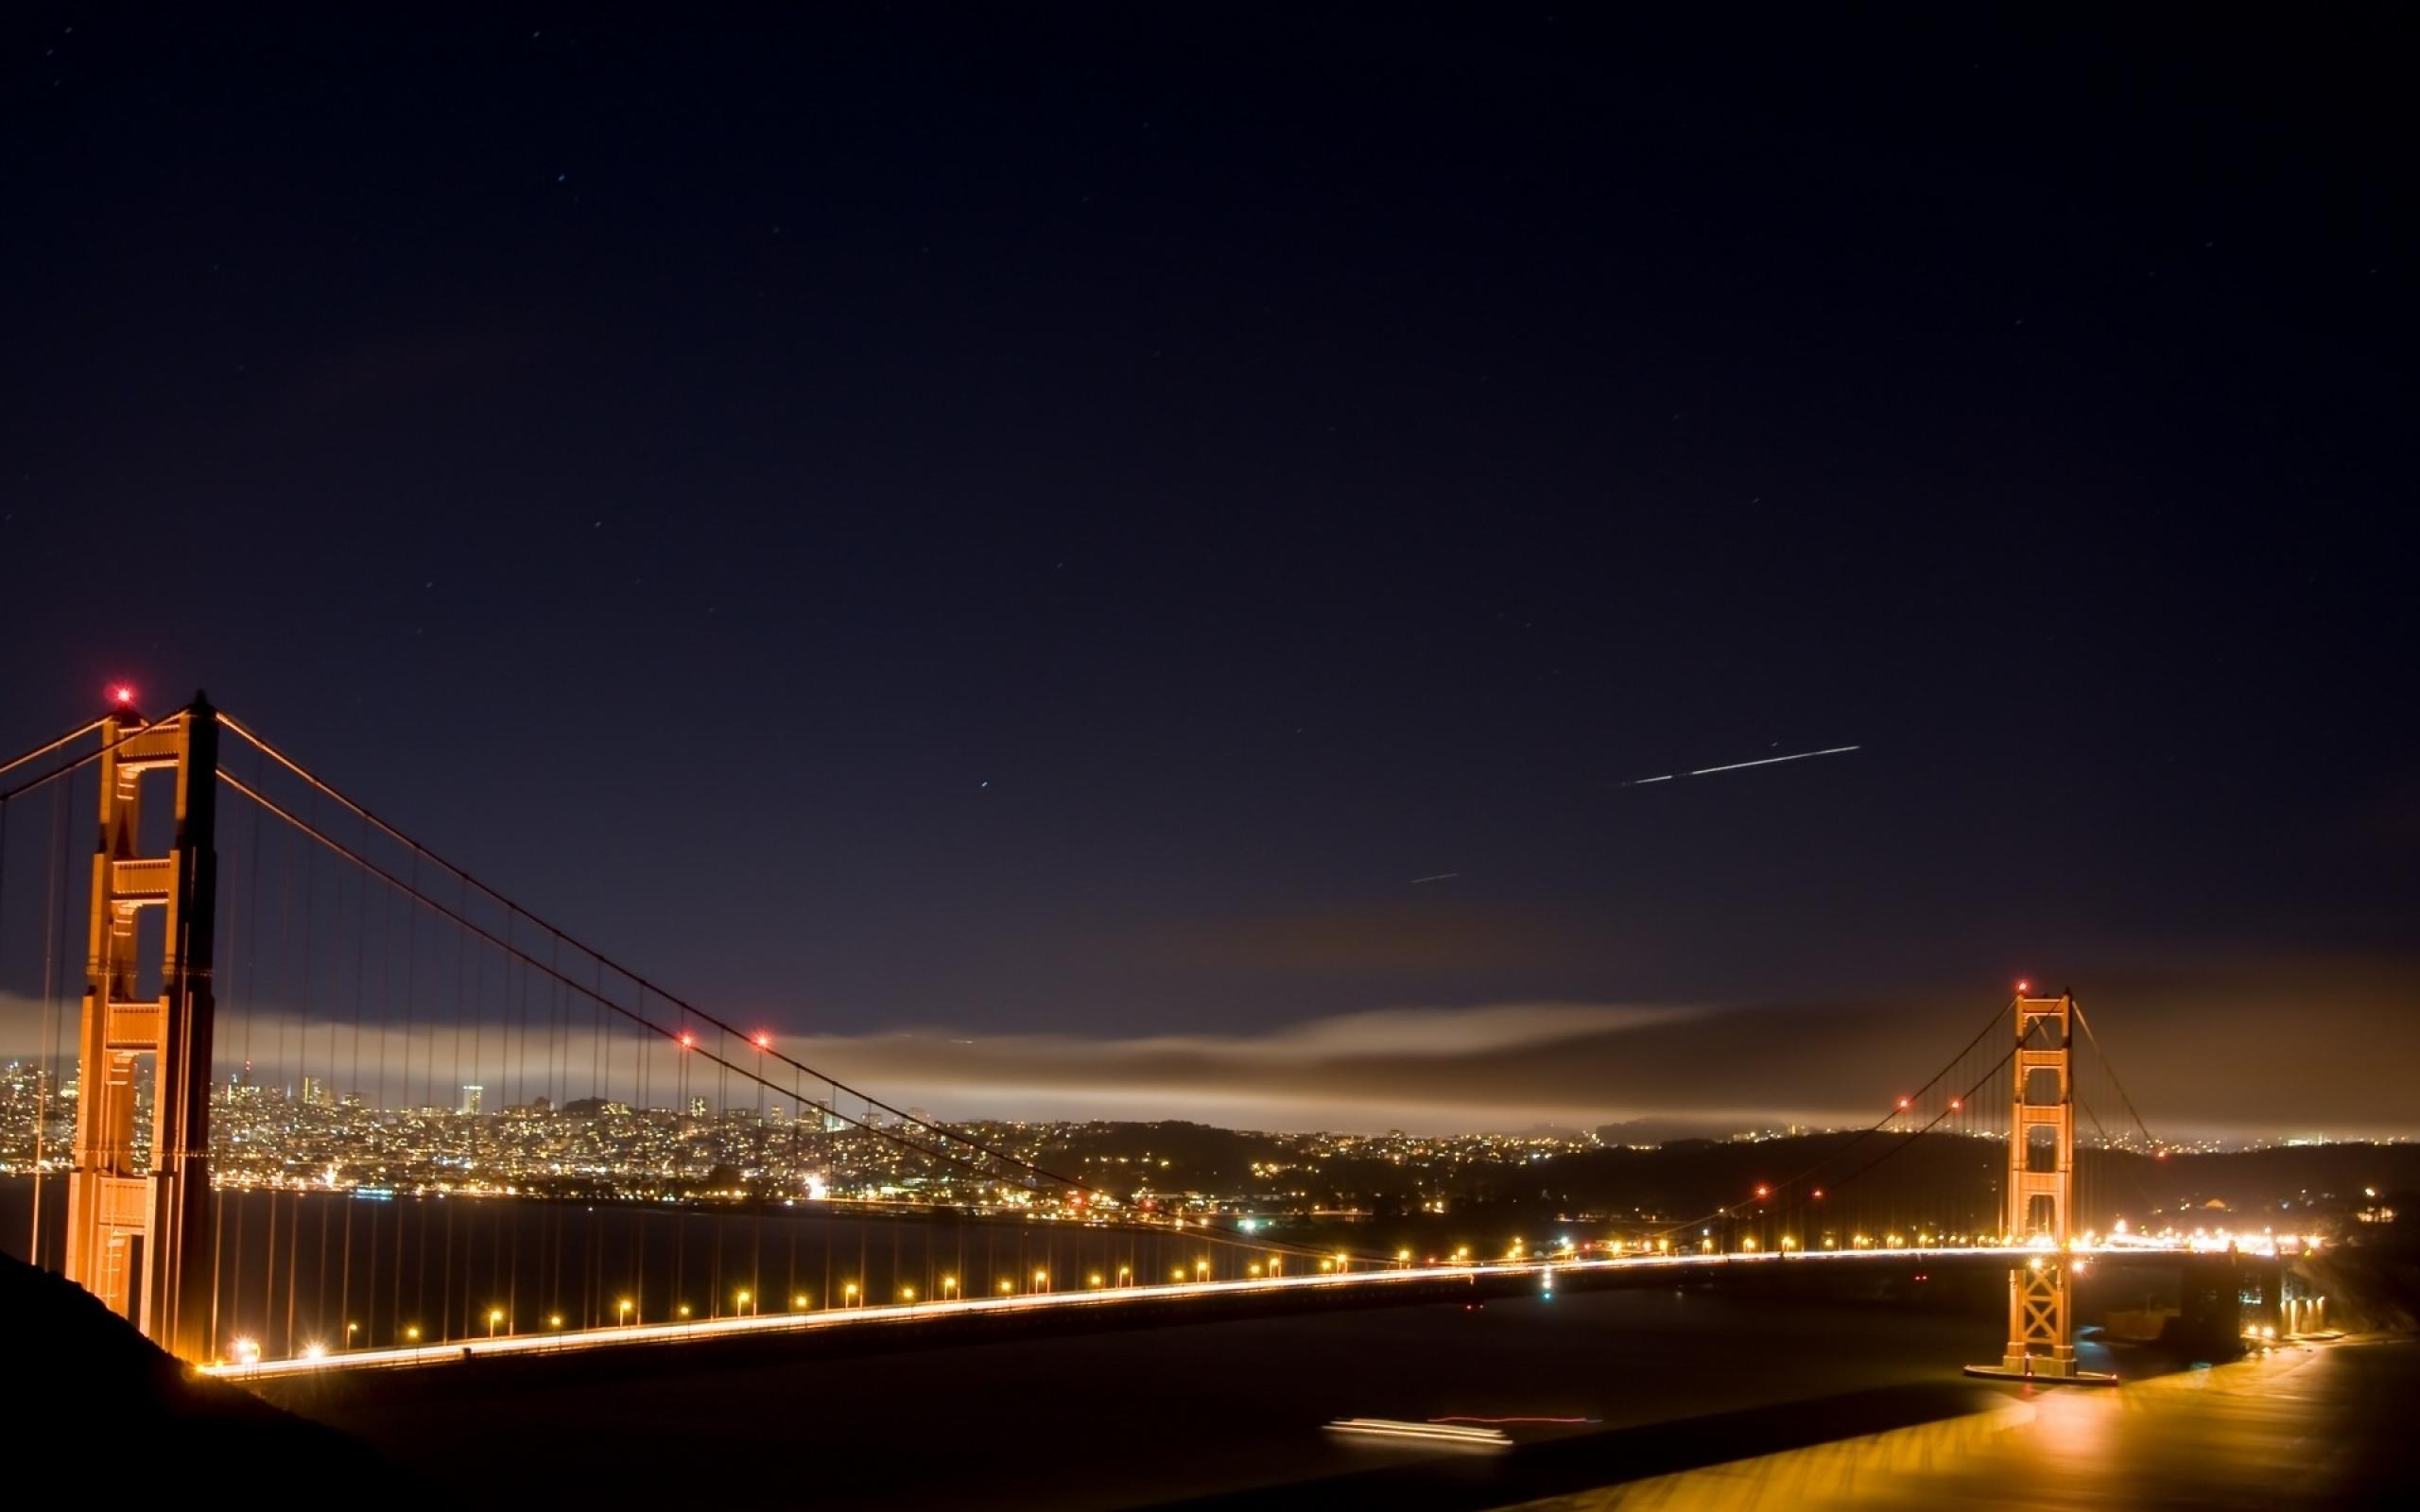 Мост огни ночь  № 3716541 без смс